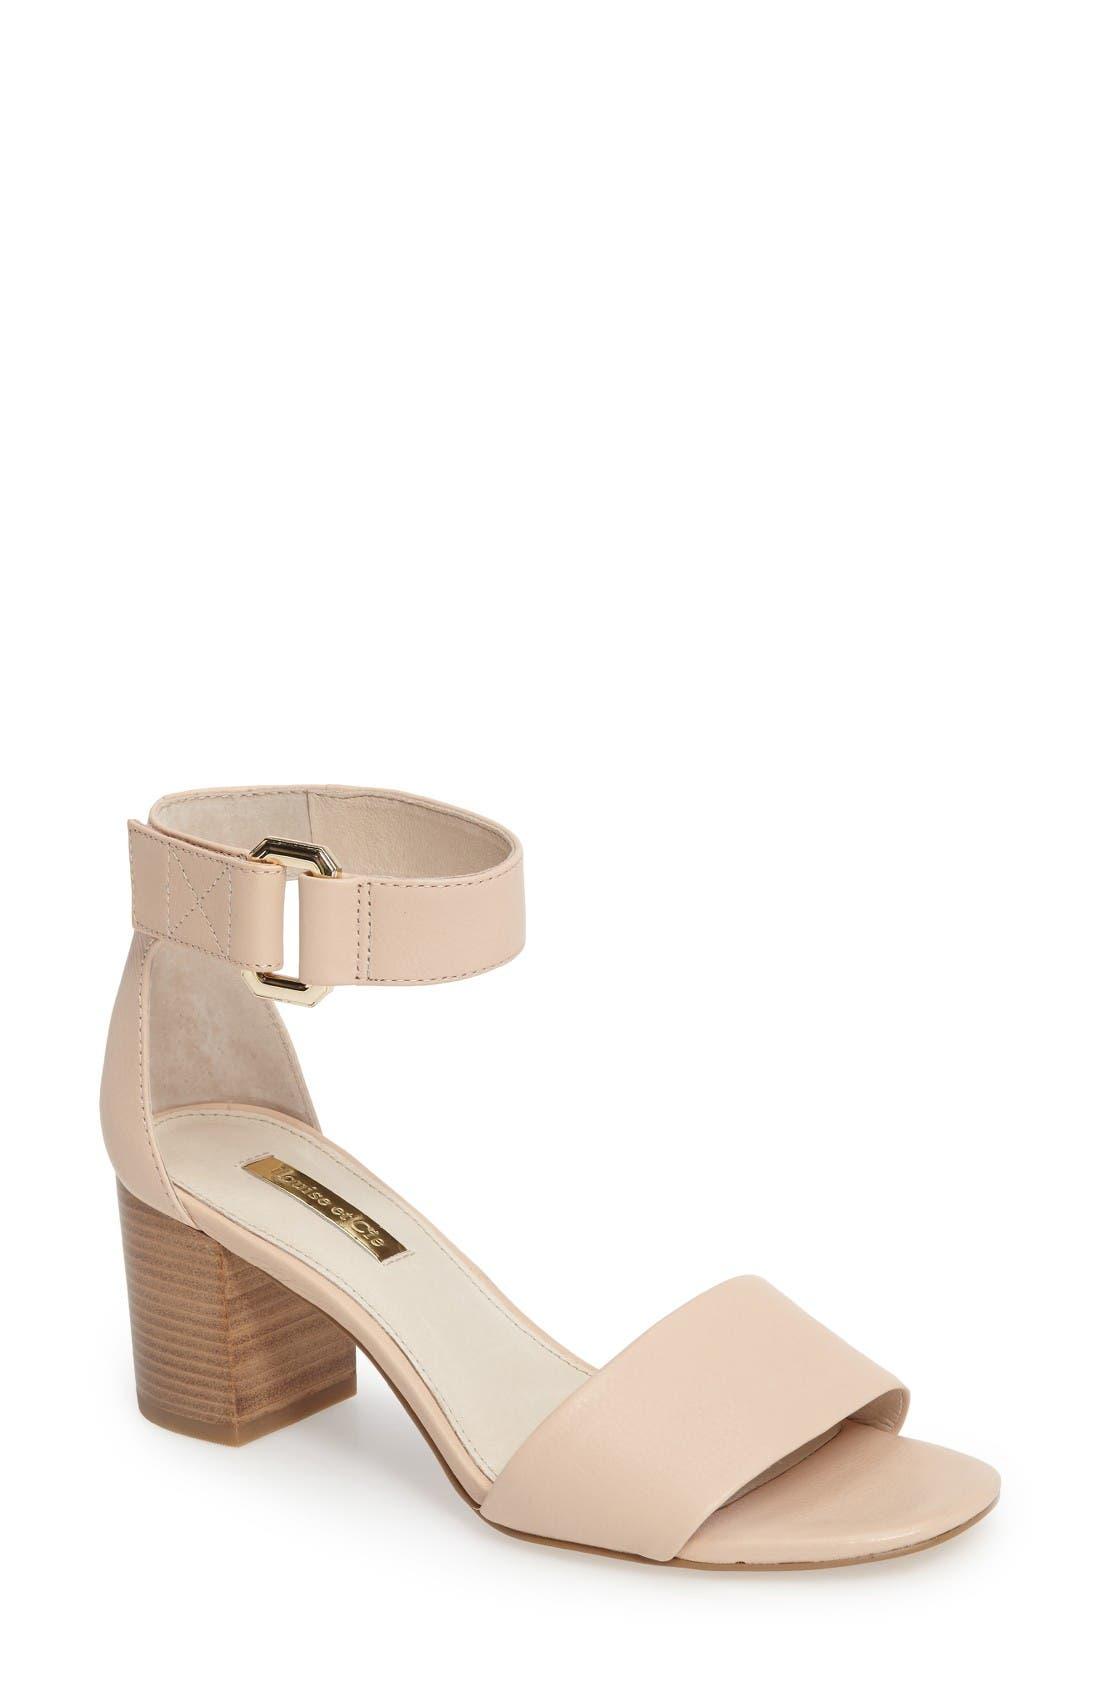 Main Image - Louise et Cie Kambria Block Heel Sandal (Women)